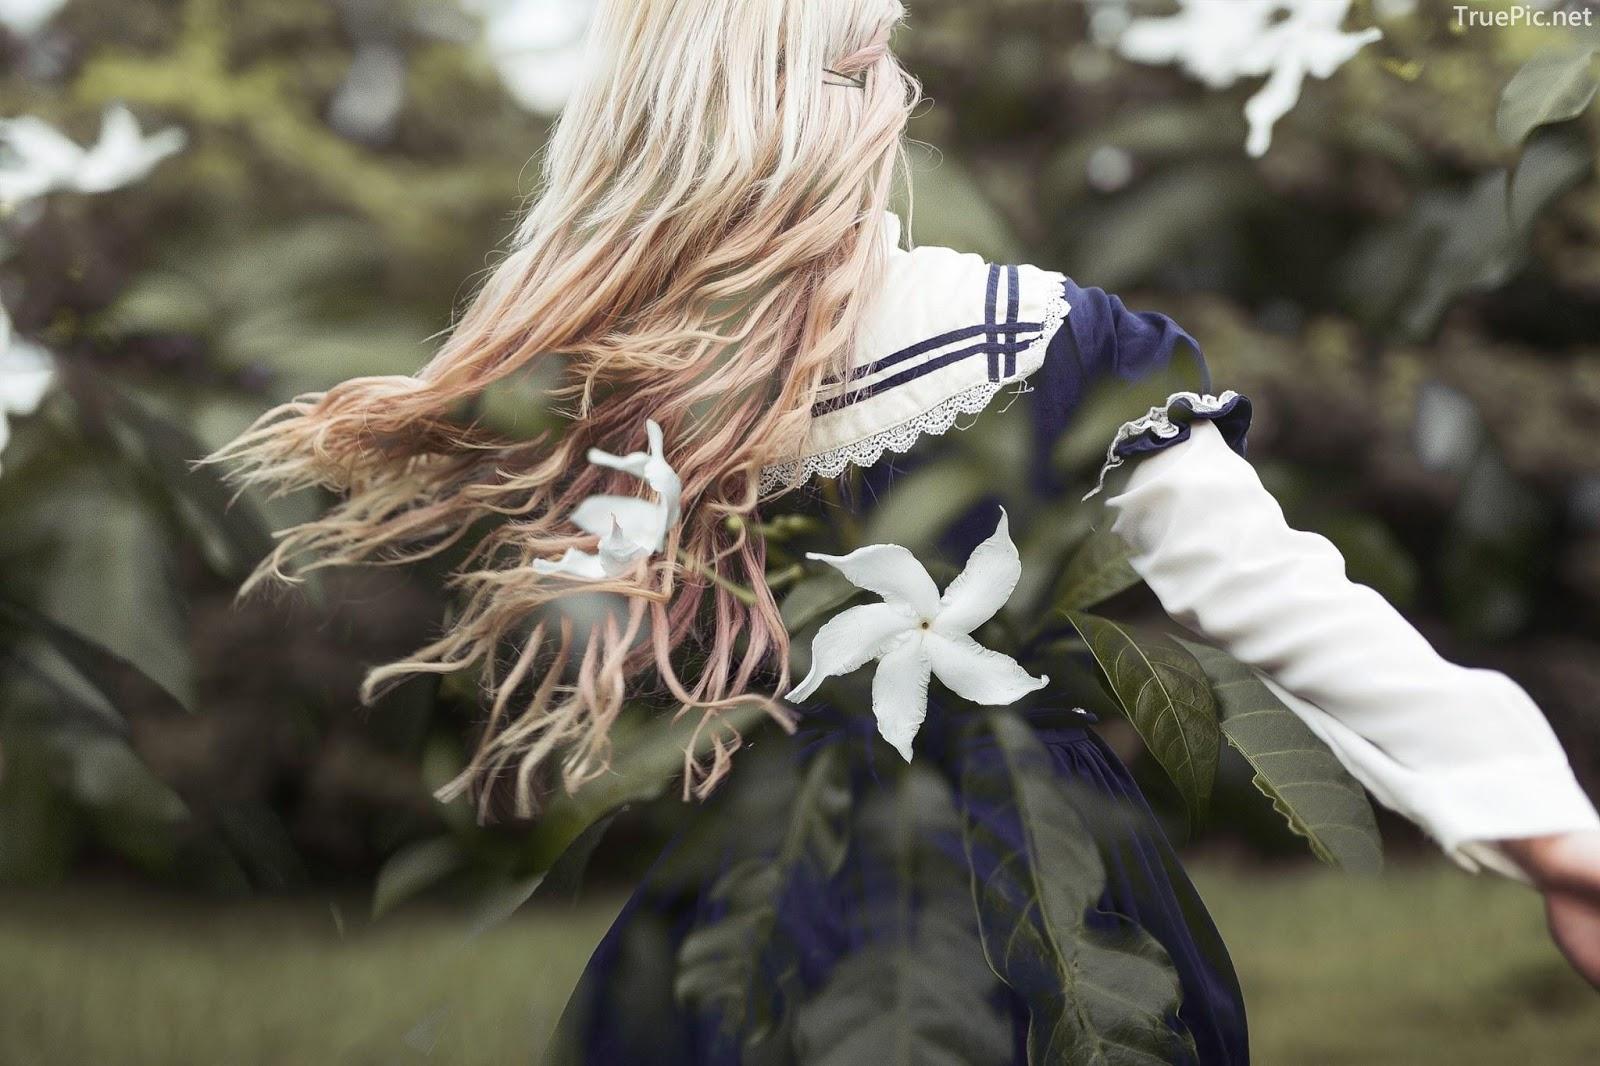 Thailand model - บวรรัตน์ มณีรัตน์ (Nia) - Lost in wonderland - Picture 10